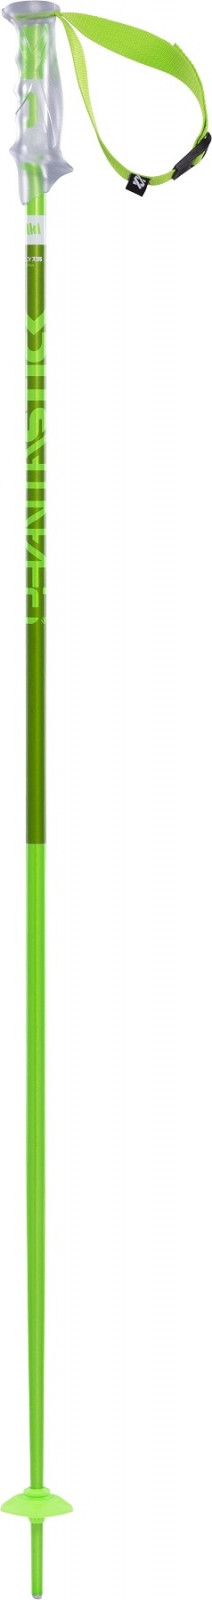 Völkl Phantastick 2 - zelená